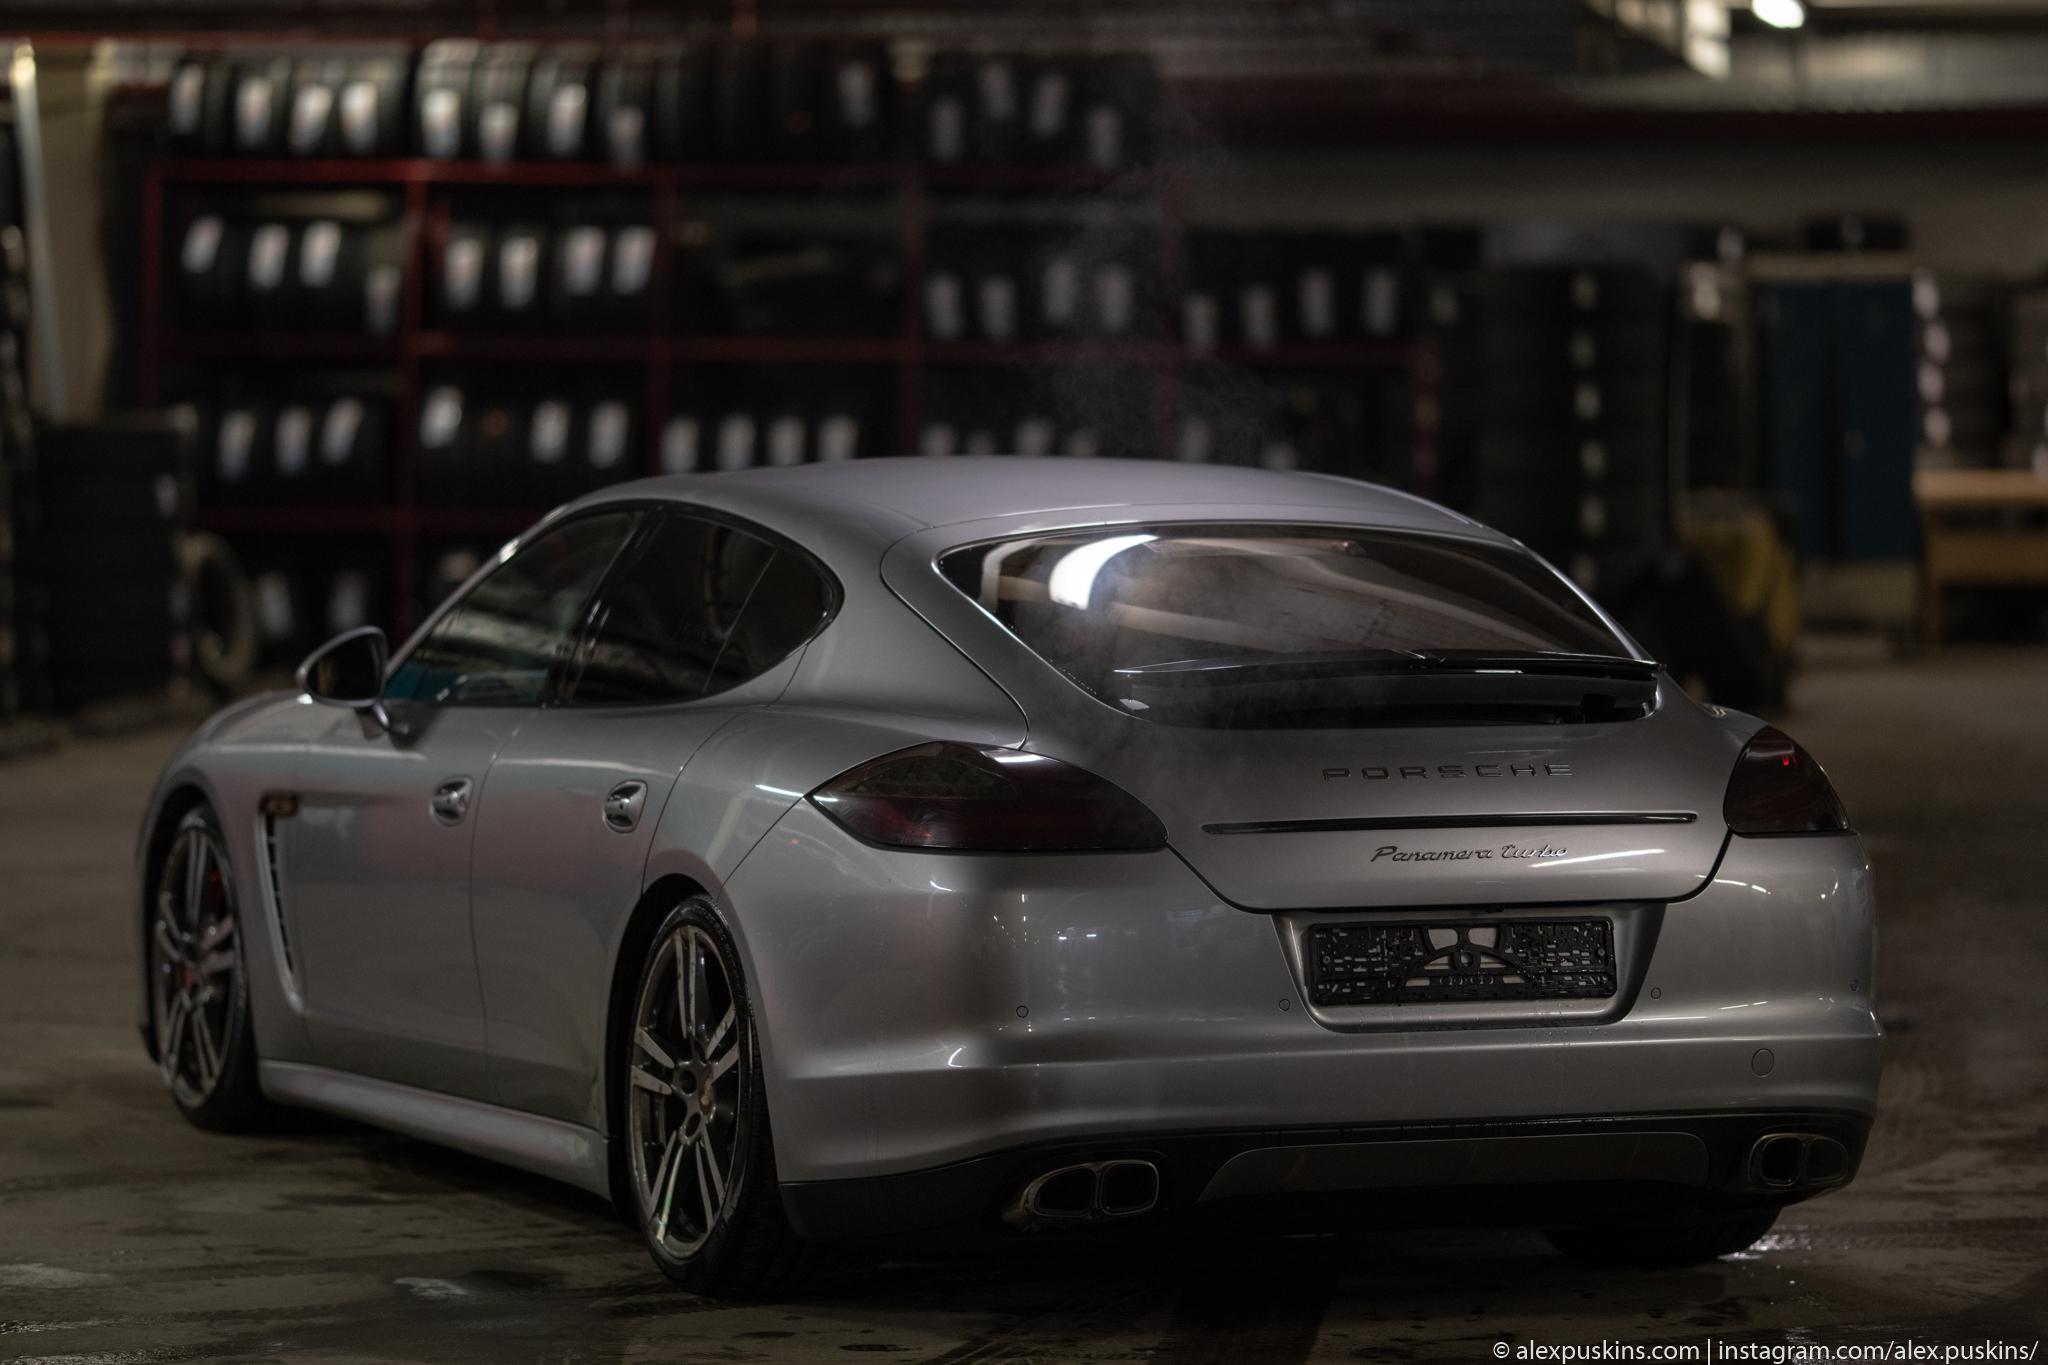 Интересные новости про Audi и Peugeot на веб-ресурсе Autobrands.lv